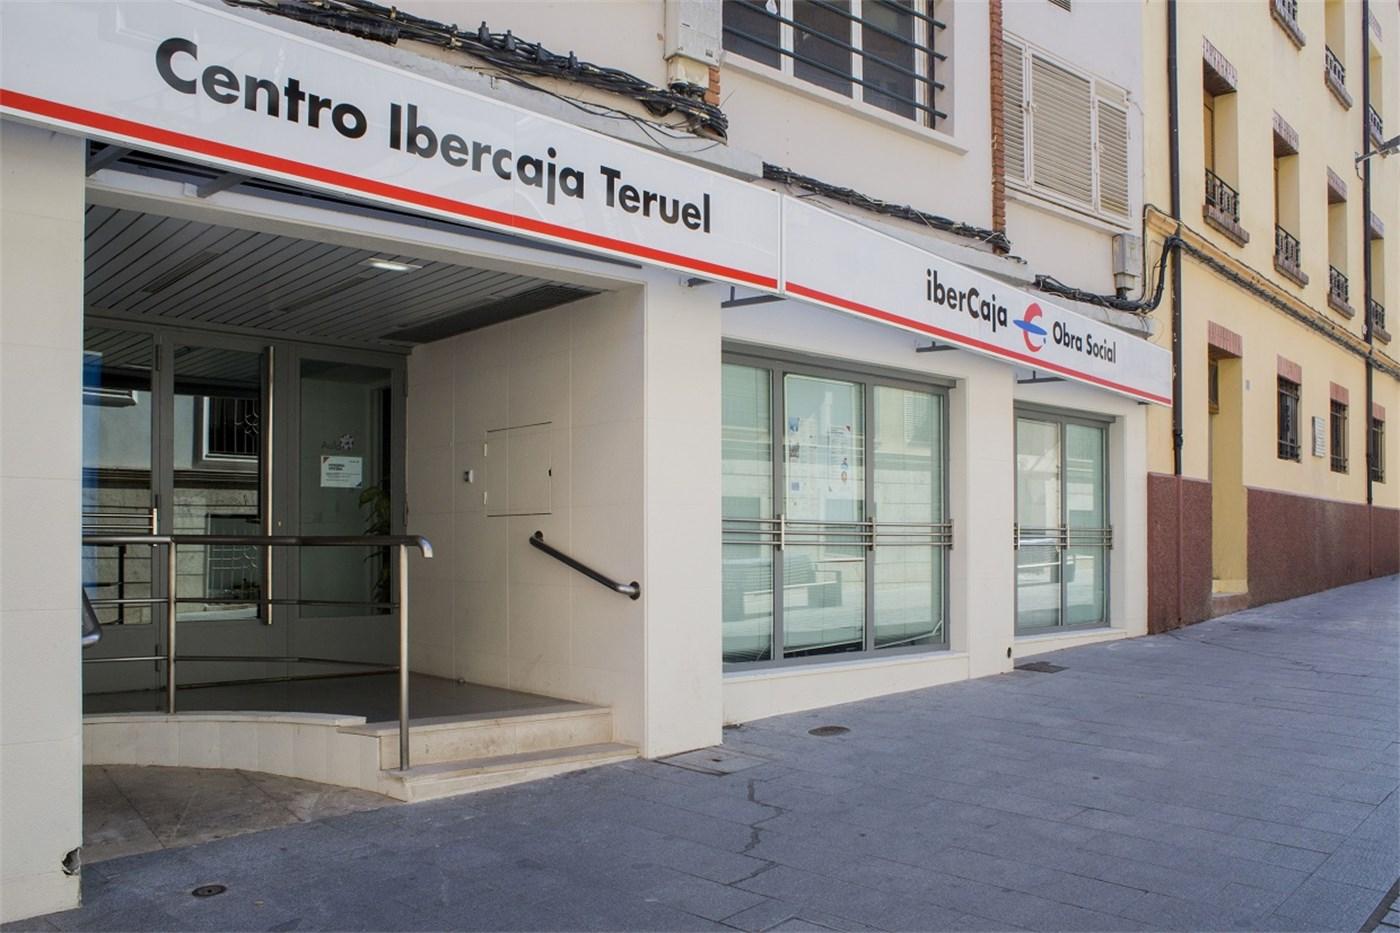 Centro Ibercaja Teruel